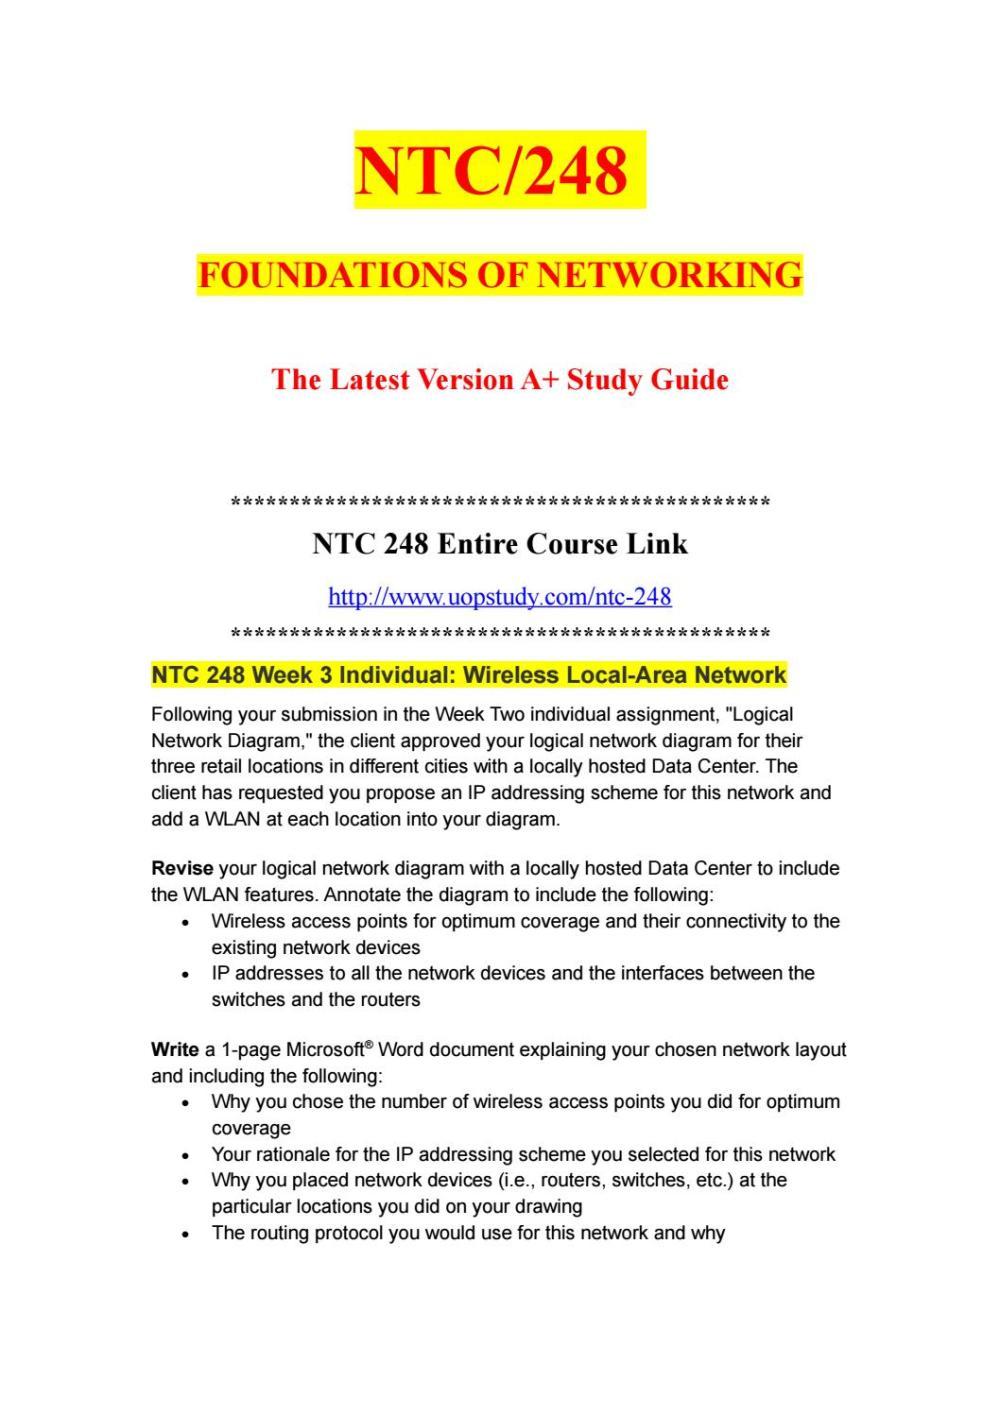 medium resolution of ntc 248 week 3 individual wireless local area network uopstudy com by uopx002 issuu